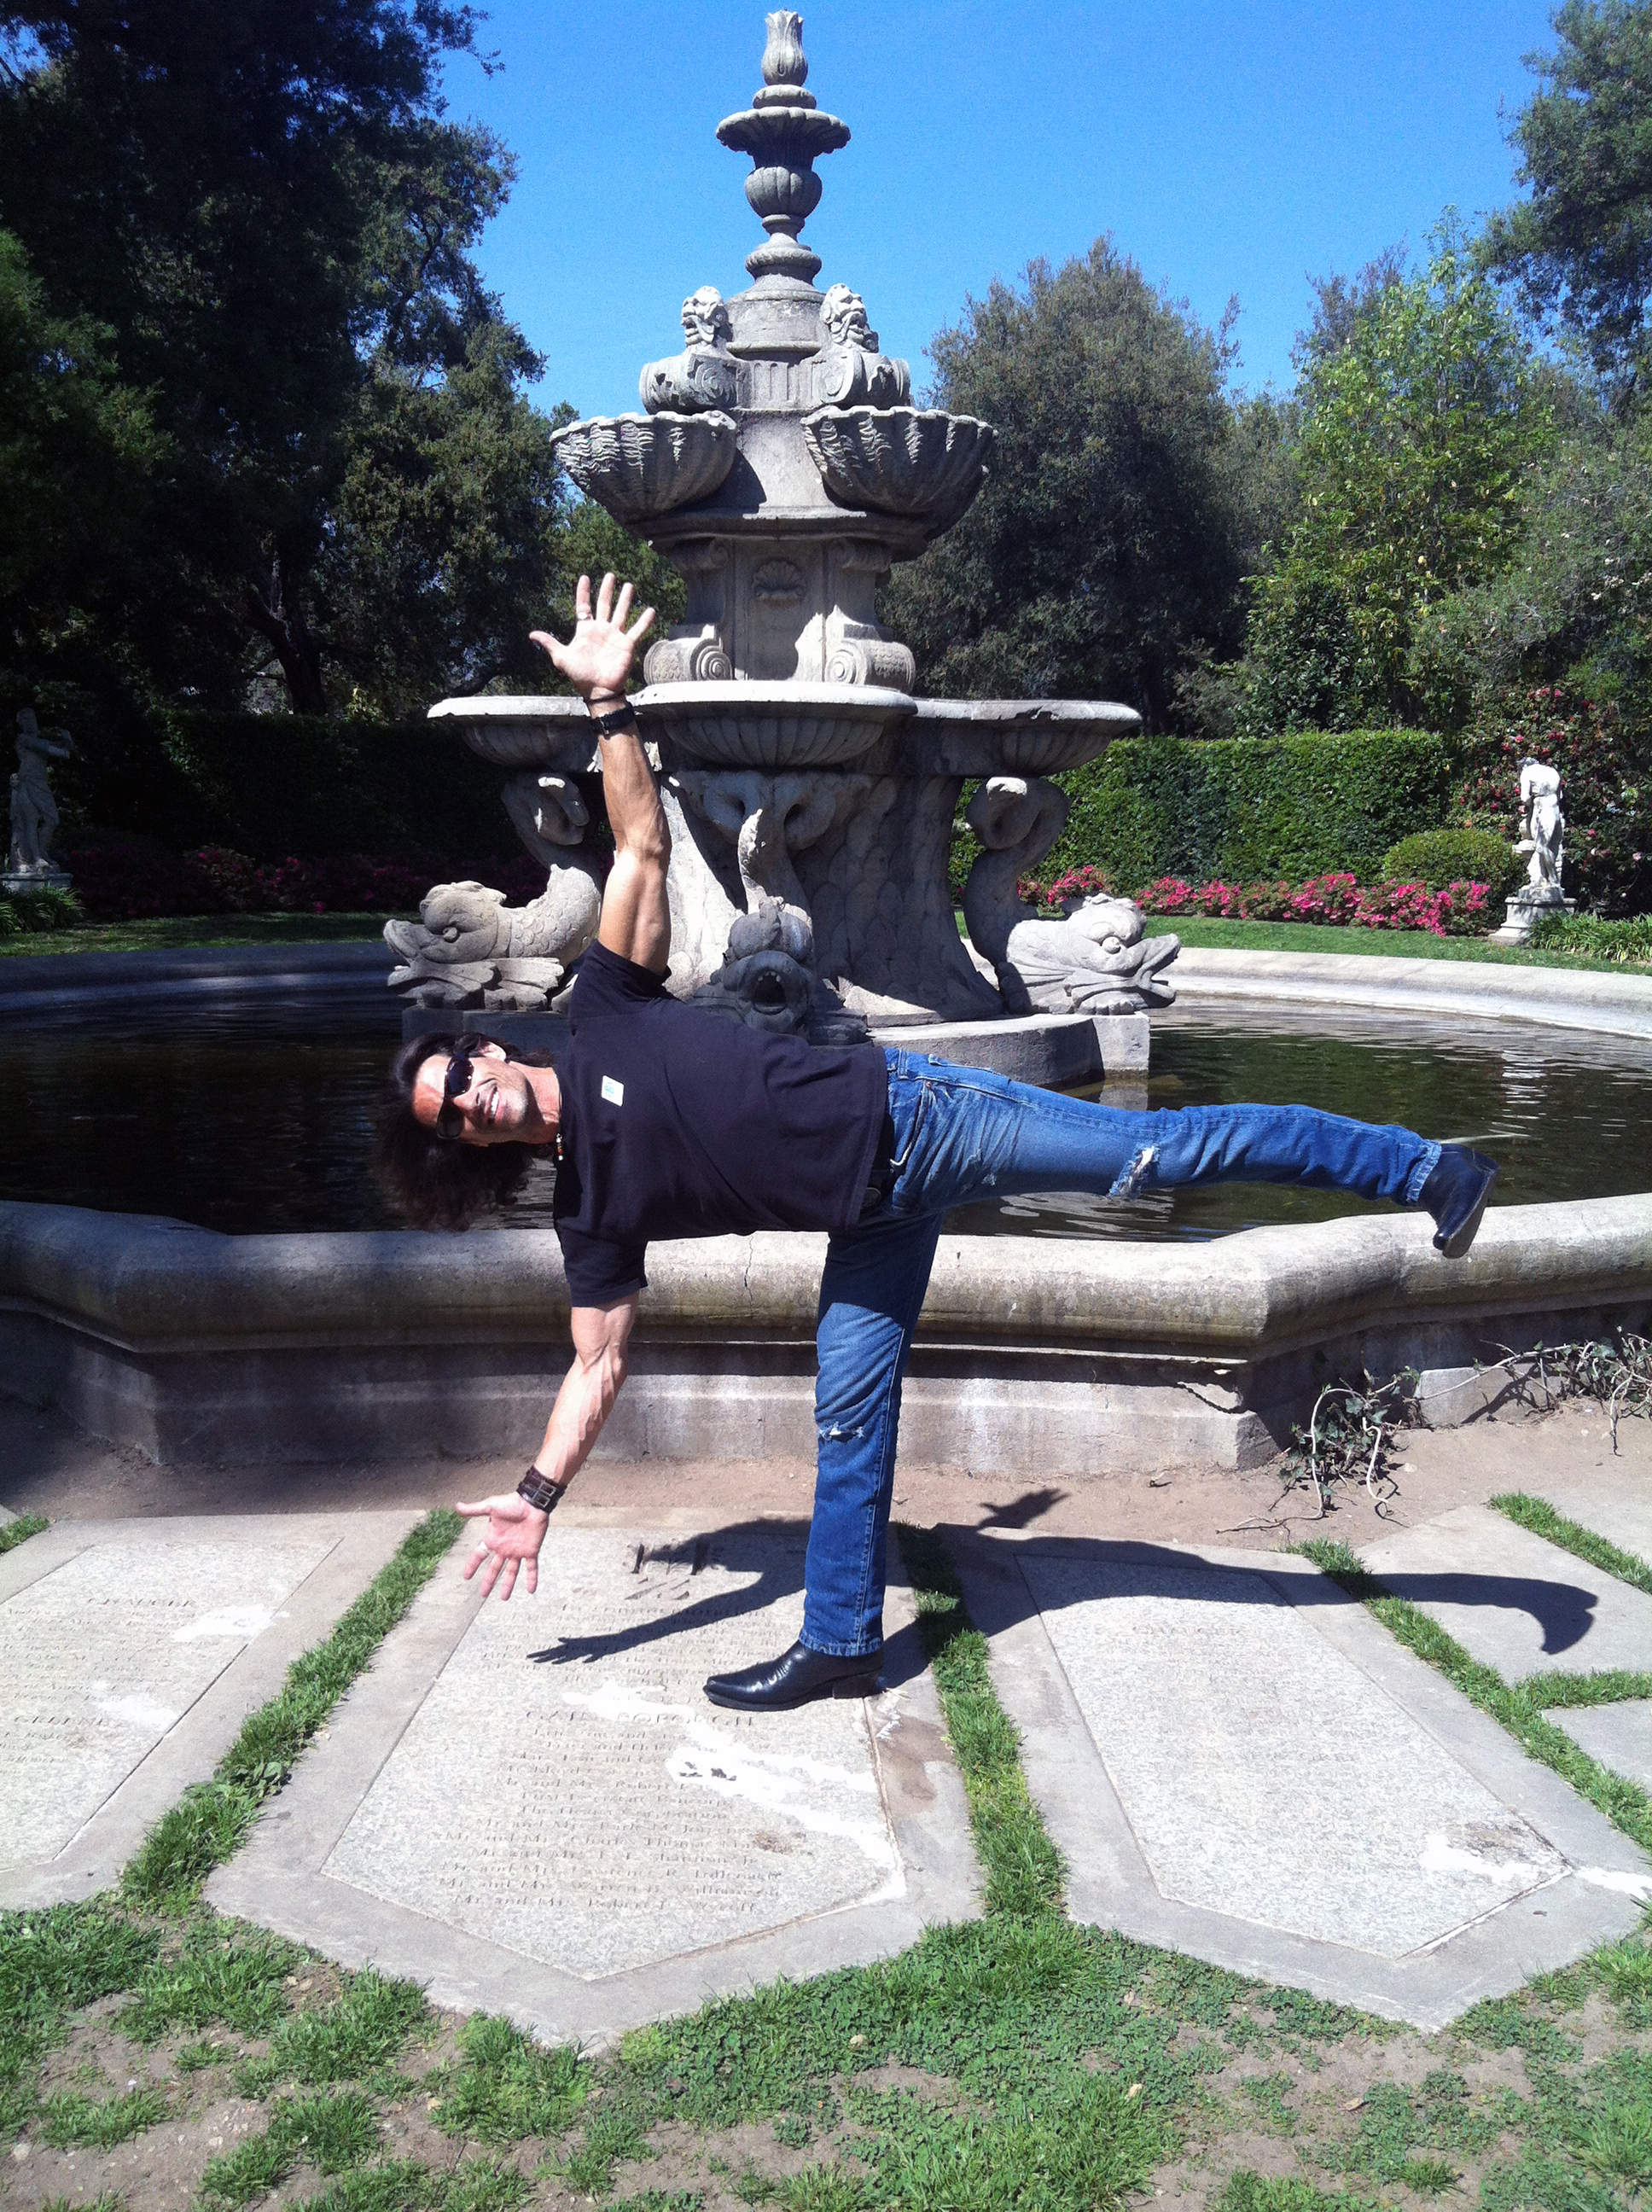 Yoga Master, Rich Tola